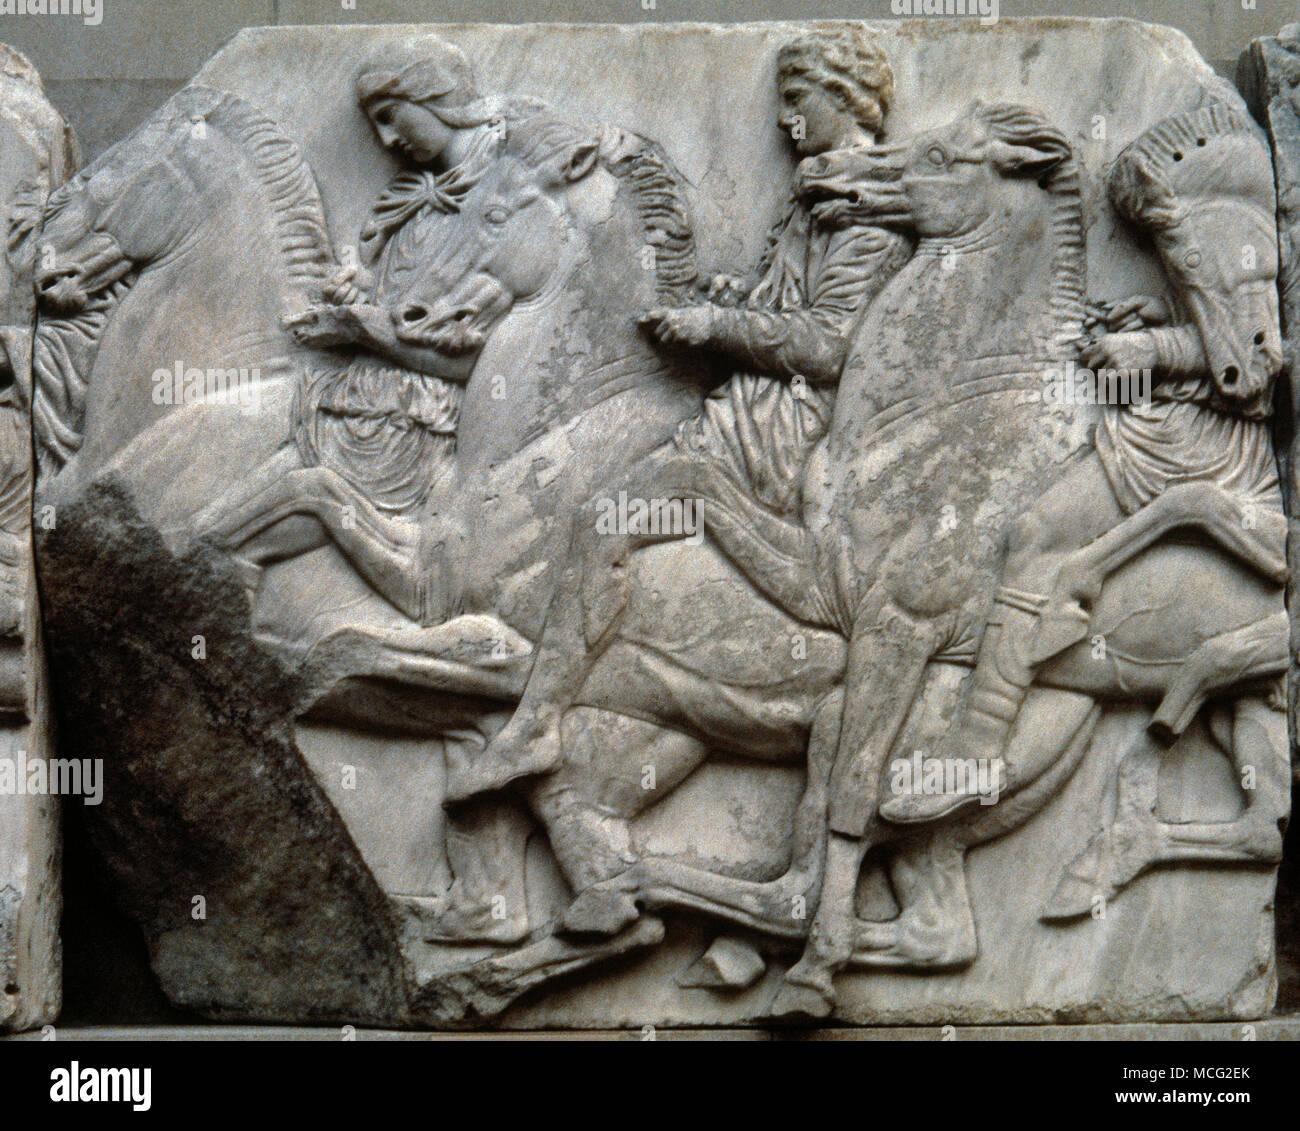 Parthenon. North Frieze. Horseman. Stone number N XLIV, Figures, N 122, N 123. 5th century BC. Pentelic marble. Acropolis of Athens. Greece. British Museum. London, United Kingdom. - Stock Image